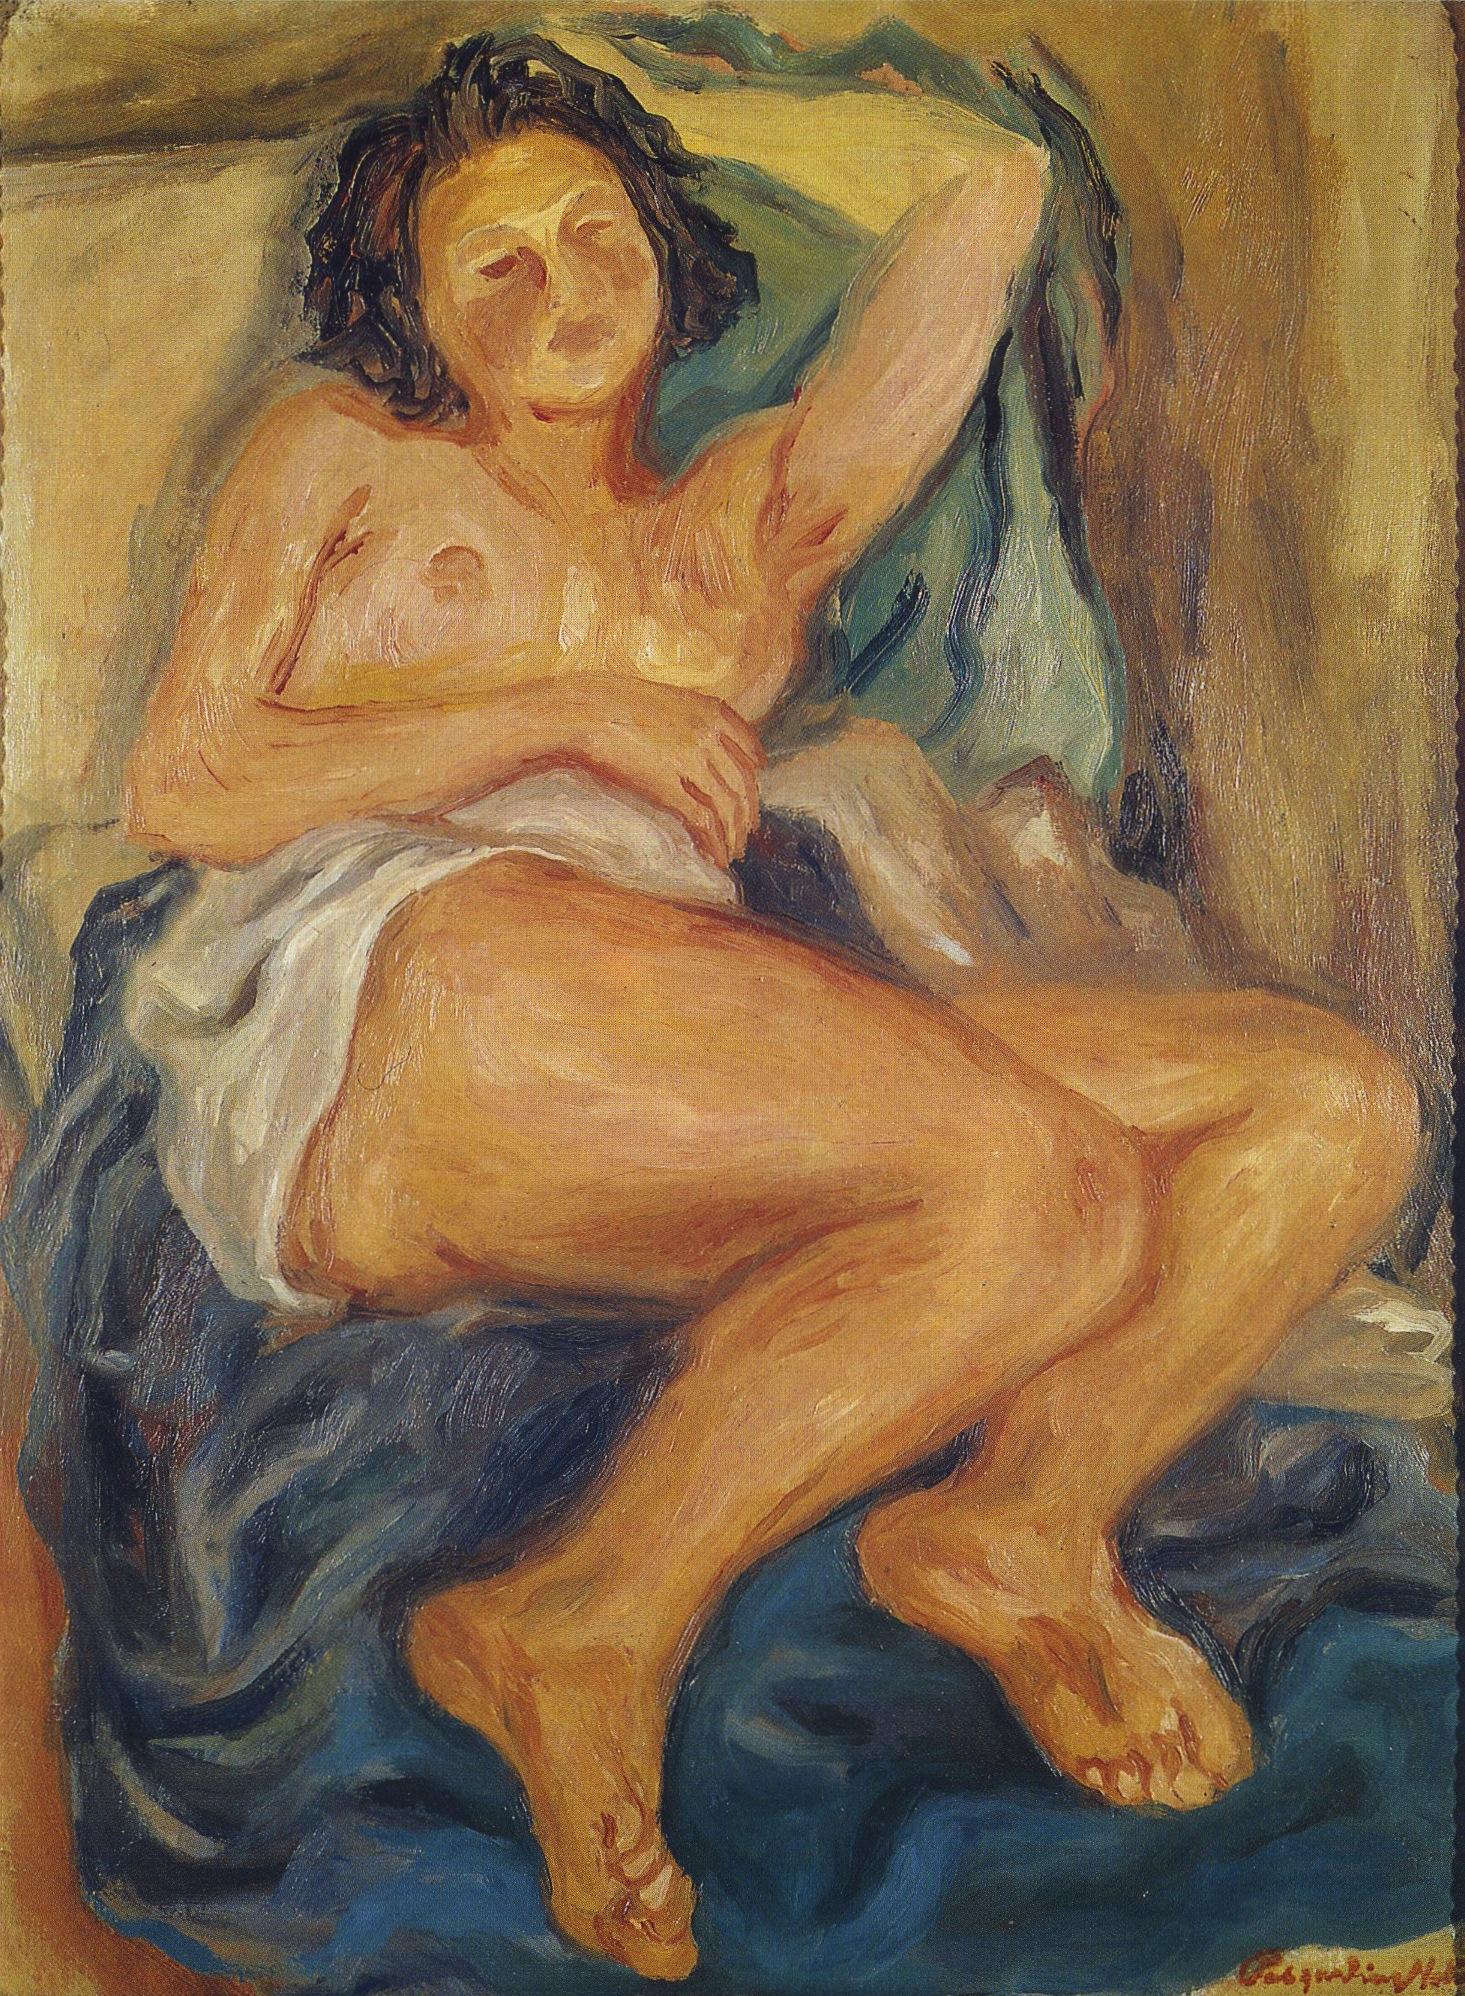 Lia Pasqualino Noto - Nudo